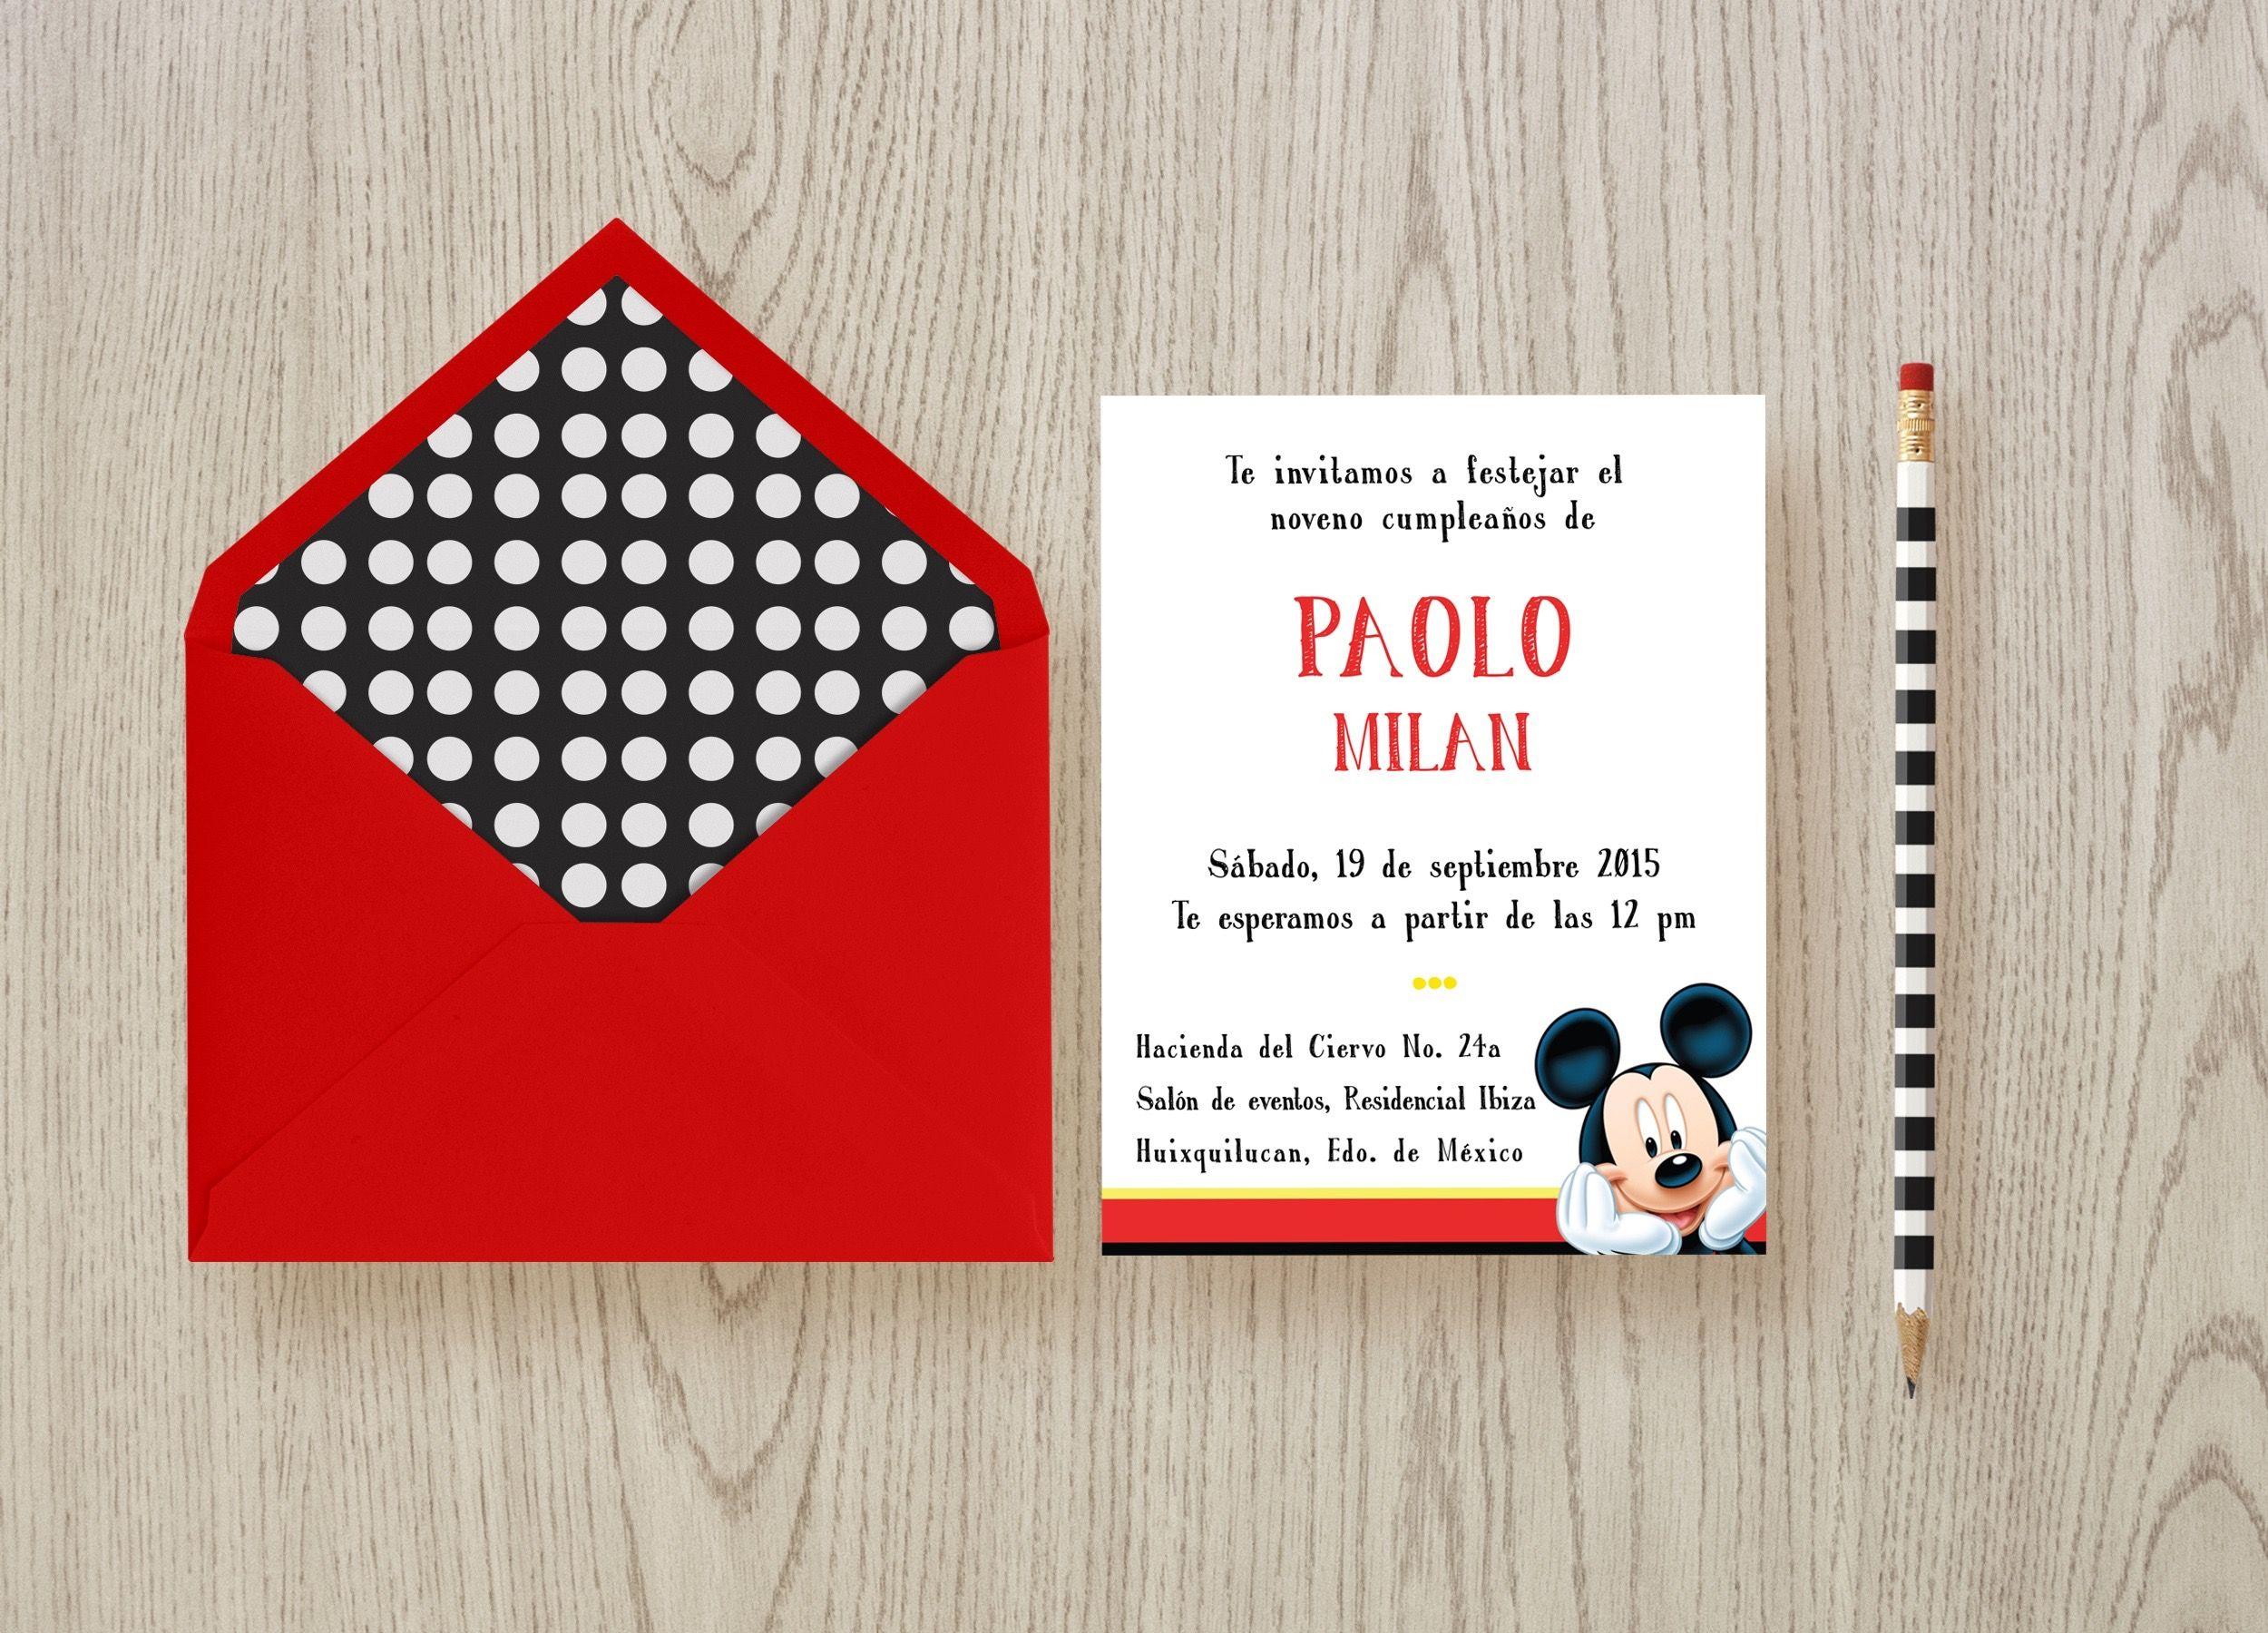 Mickey mouse birthday invitation mockup by paulette puerner mickey mouse birthday invitation mockup by paulette puerner stopboris Choice Image